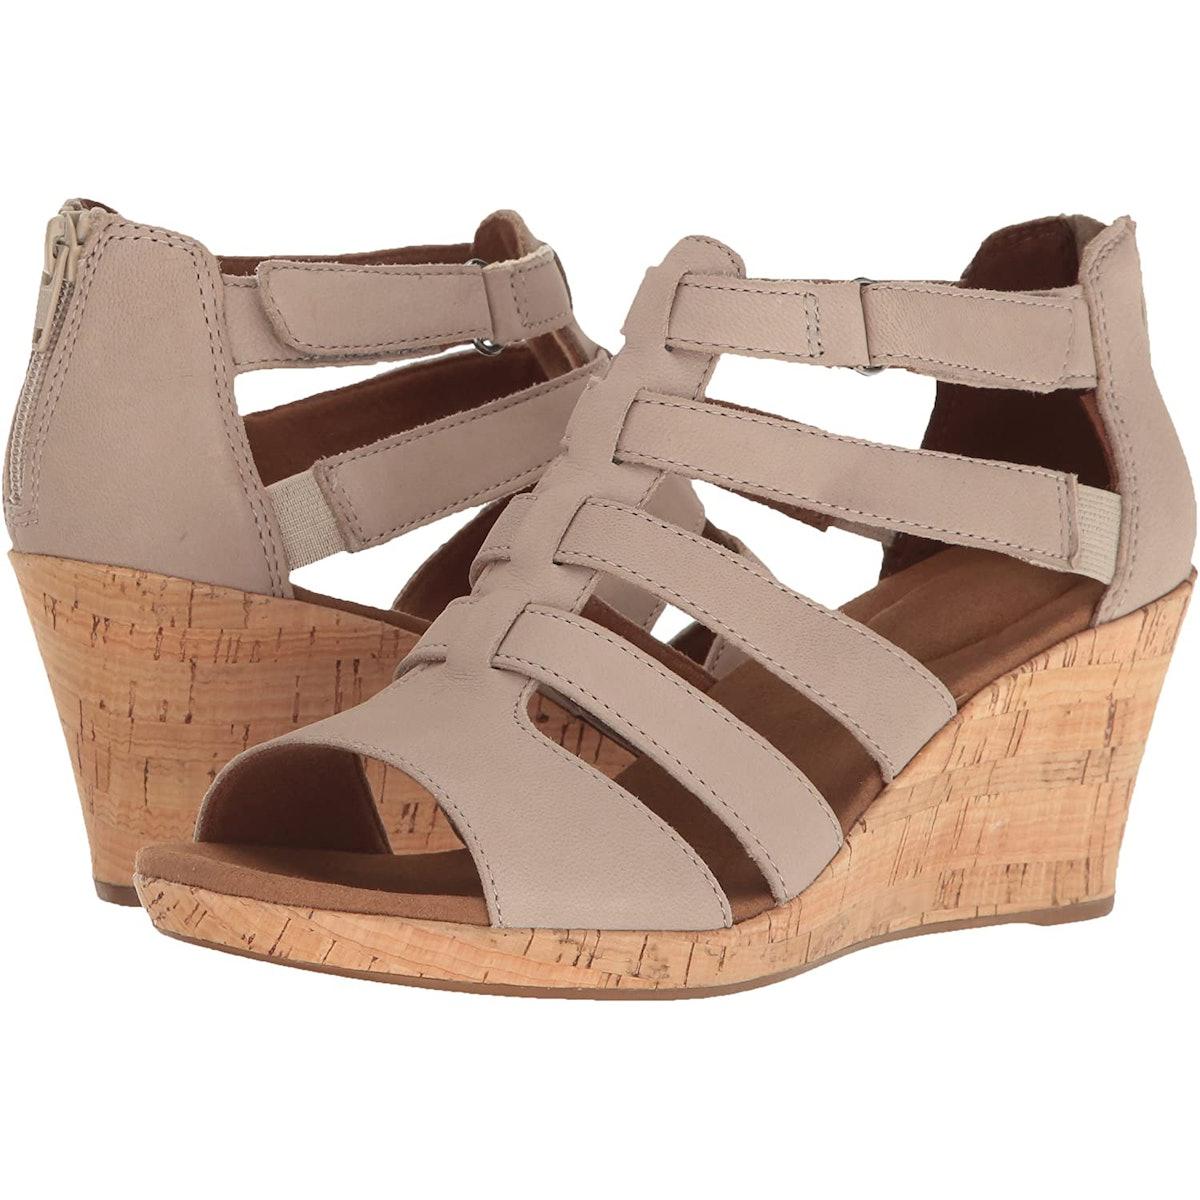 Rockport Briah Gladiator Wedge Sandals